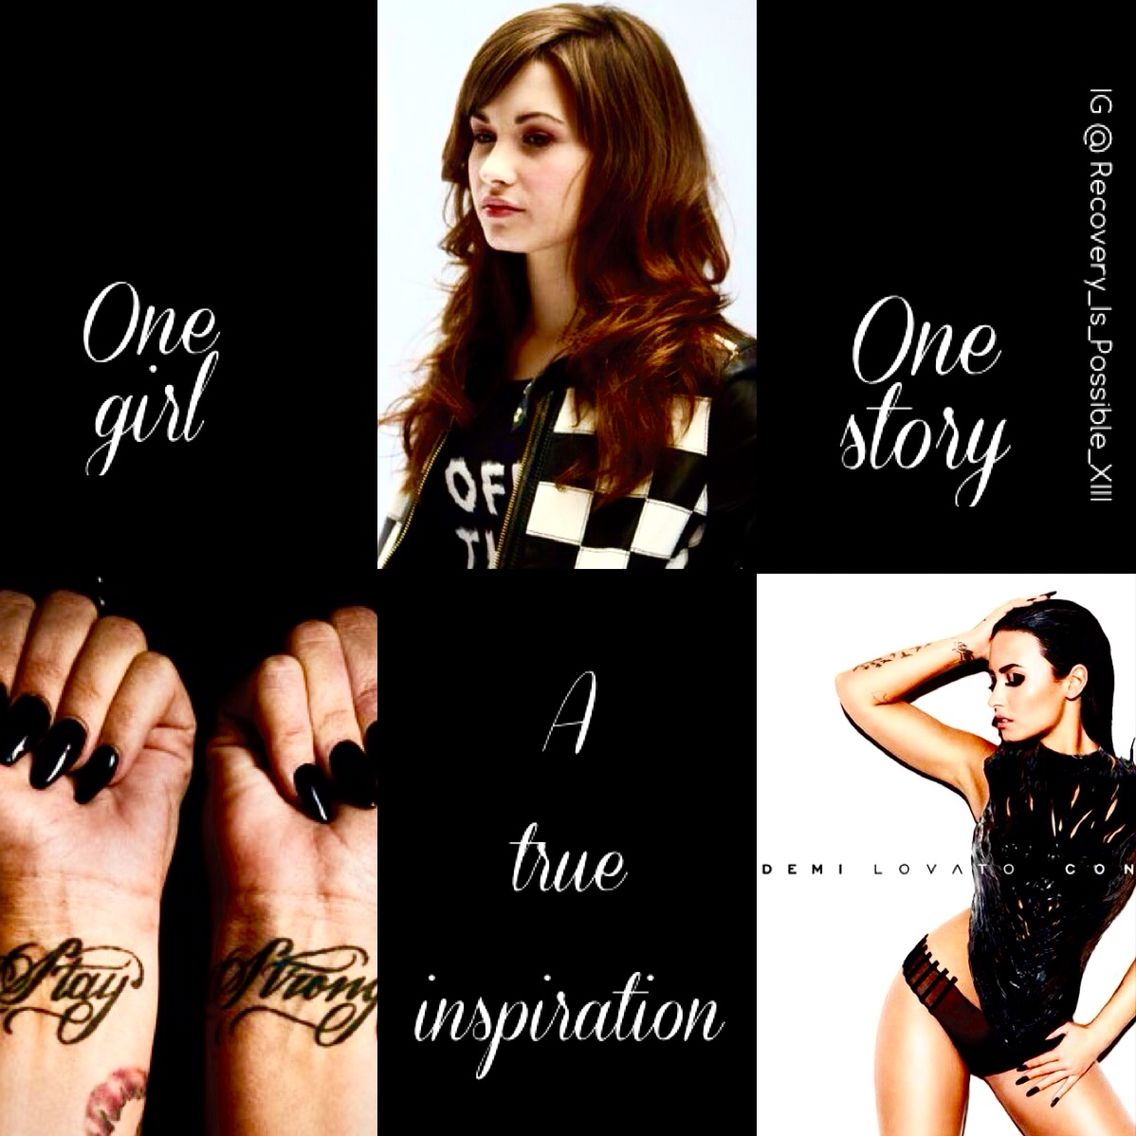 One girl. One story. A true inspiration. Demi Lovato.